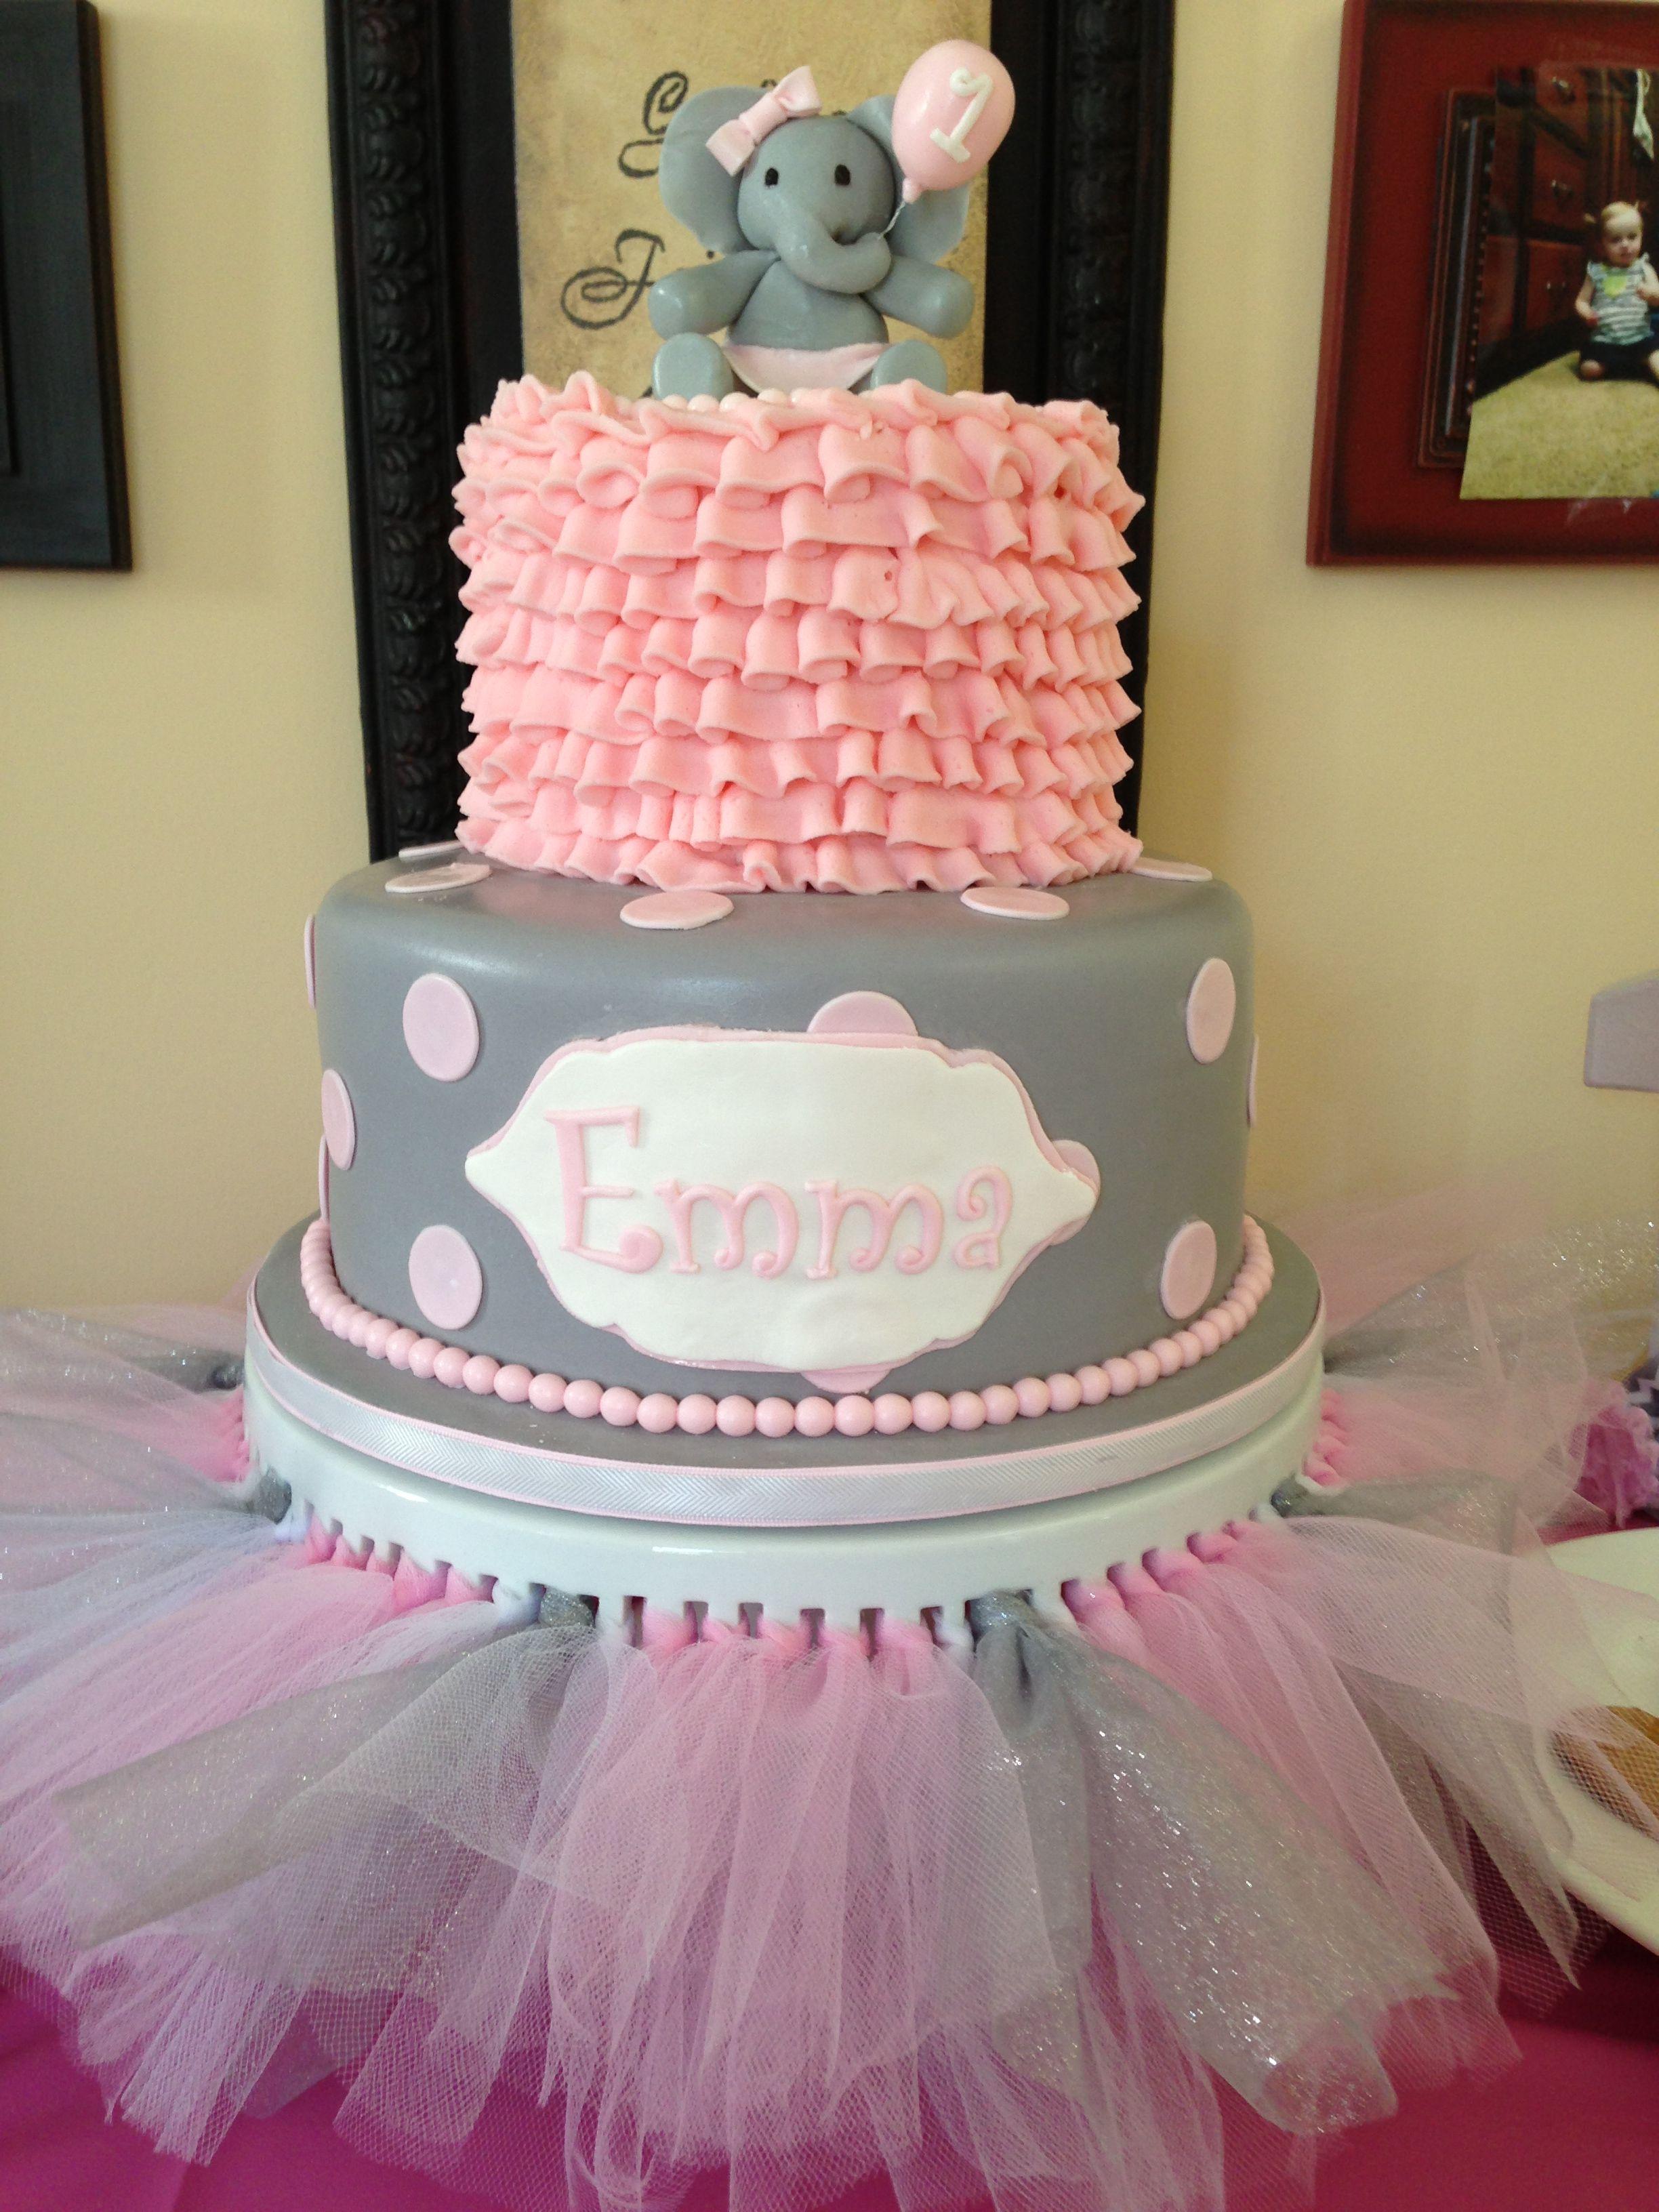 Swell Emmas Elephant Birthday Cake Cake Made By Dessertsbydawn Cake Birthday Cards Printable Trancafe Filternl